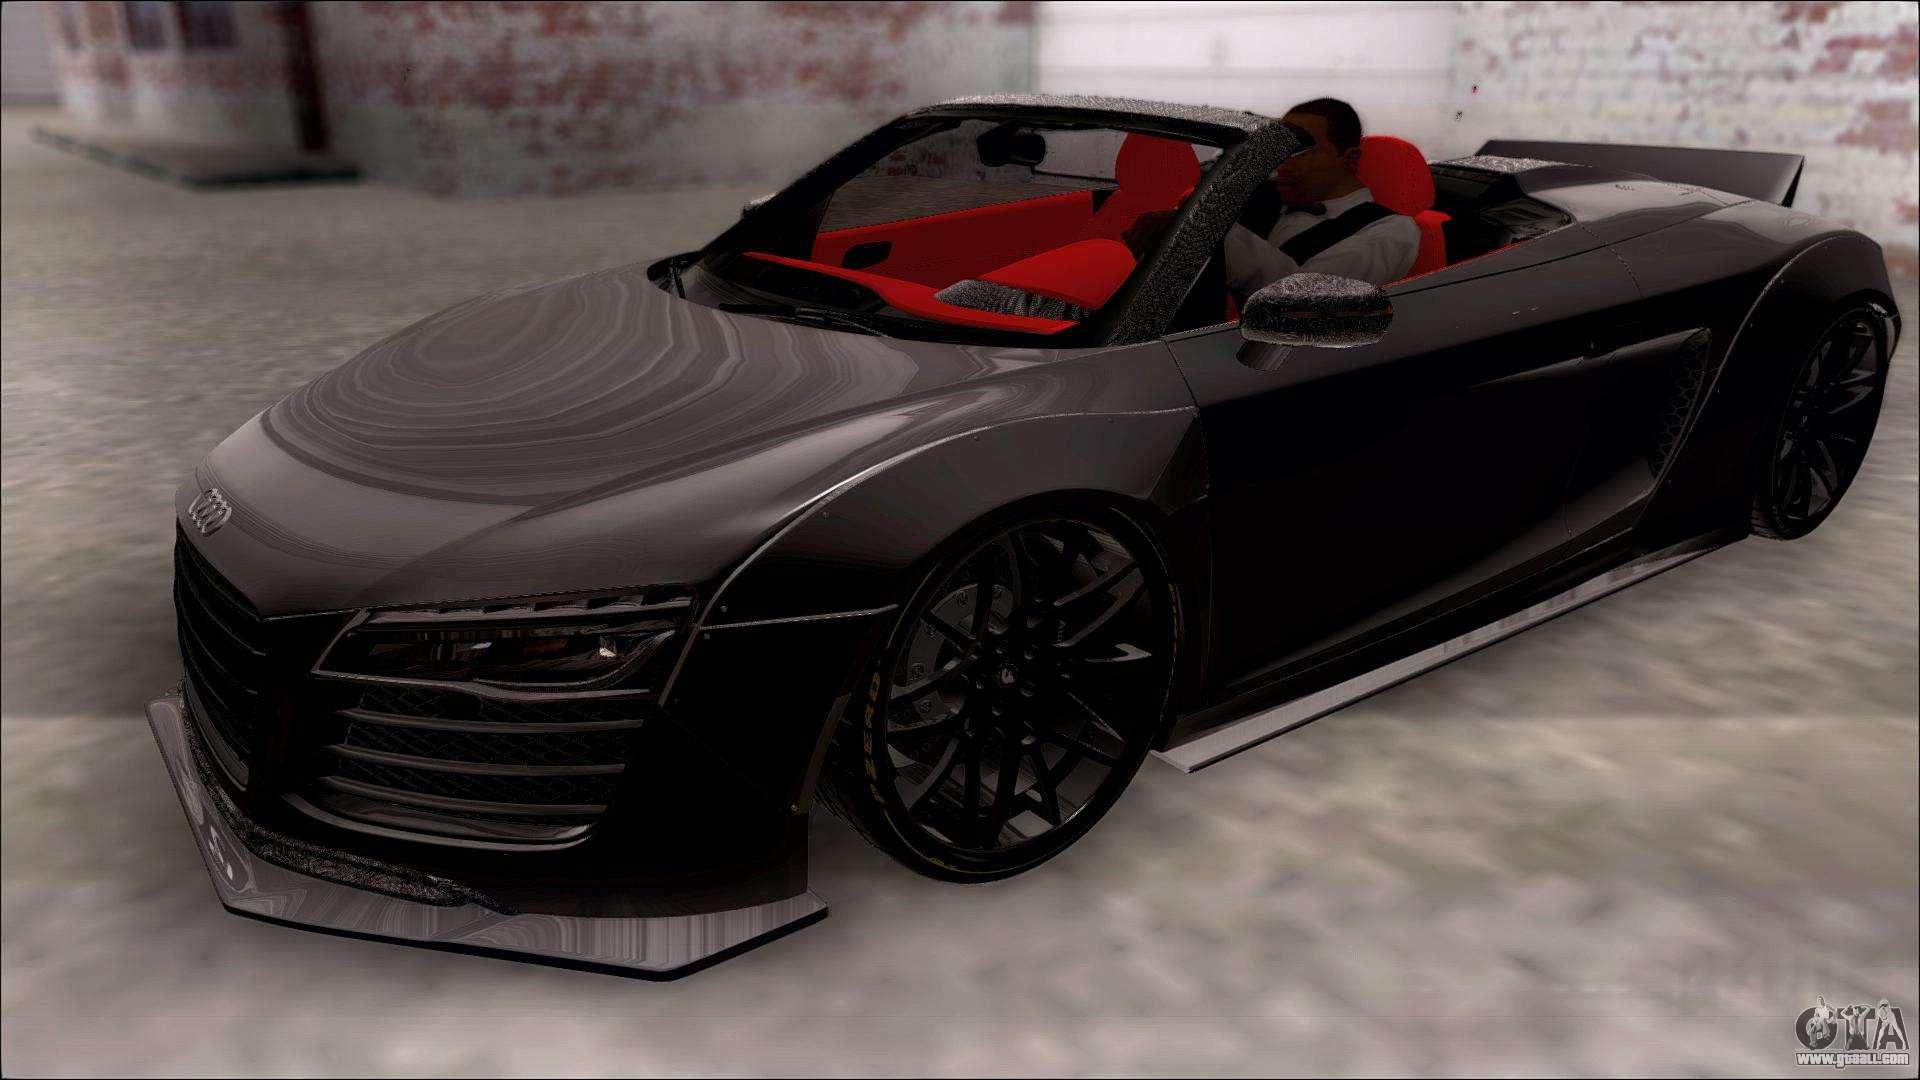 Audi r8 v10 spyder 14